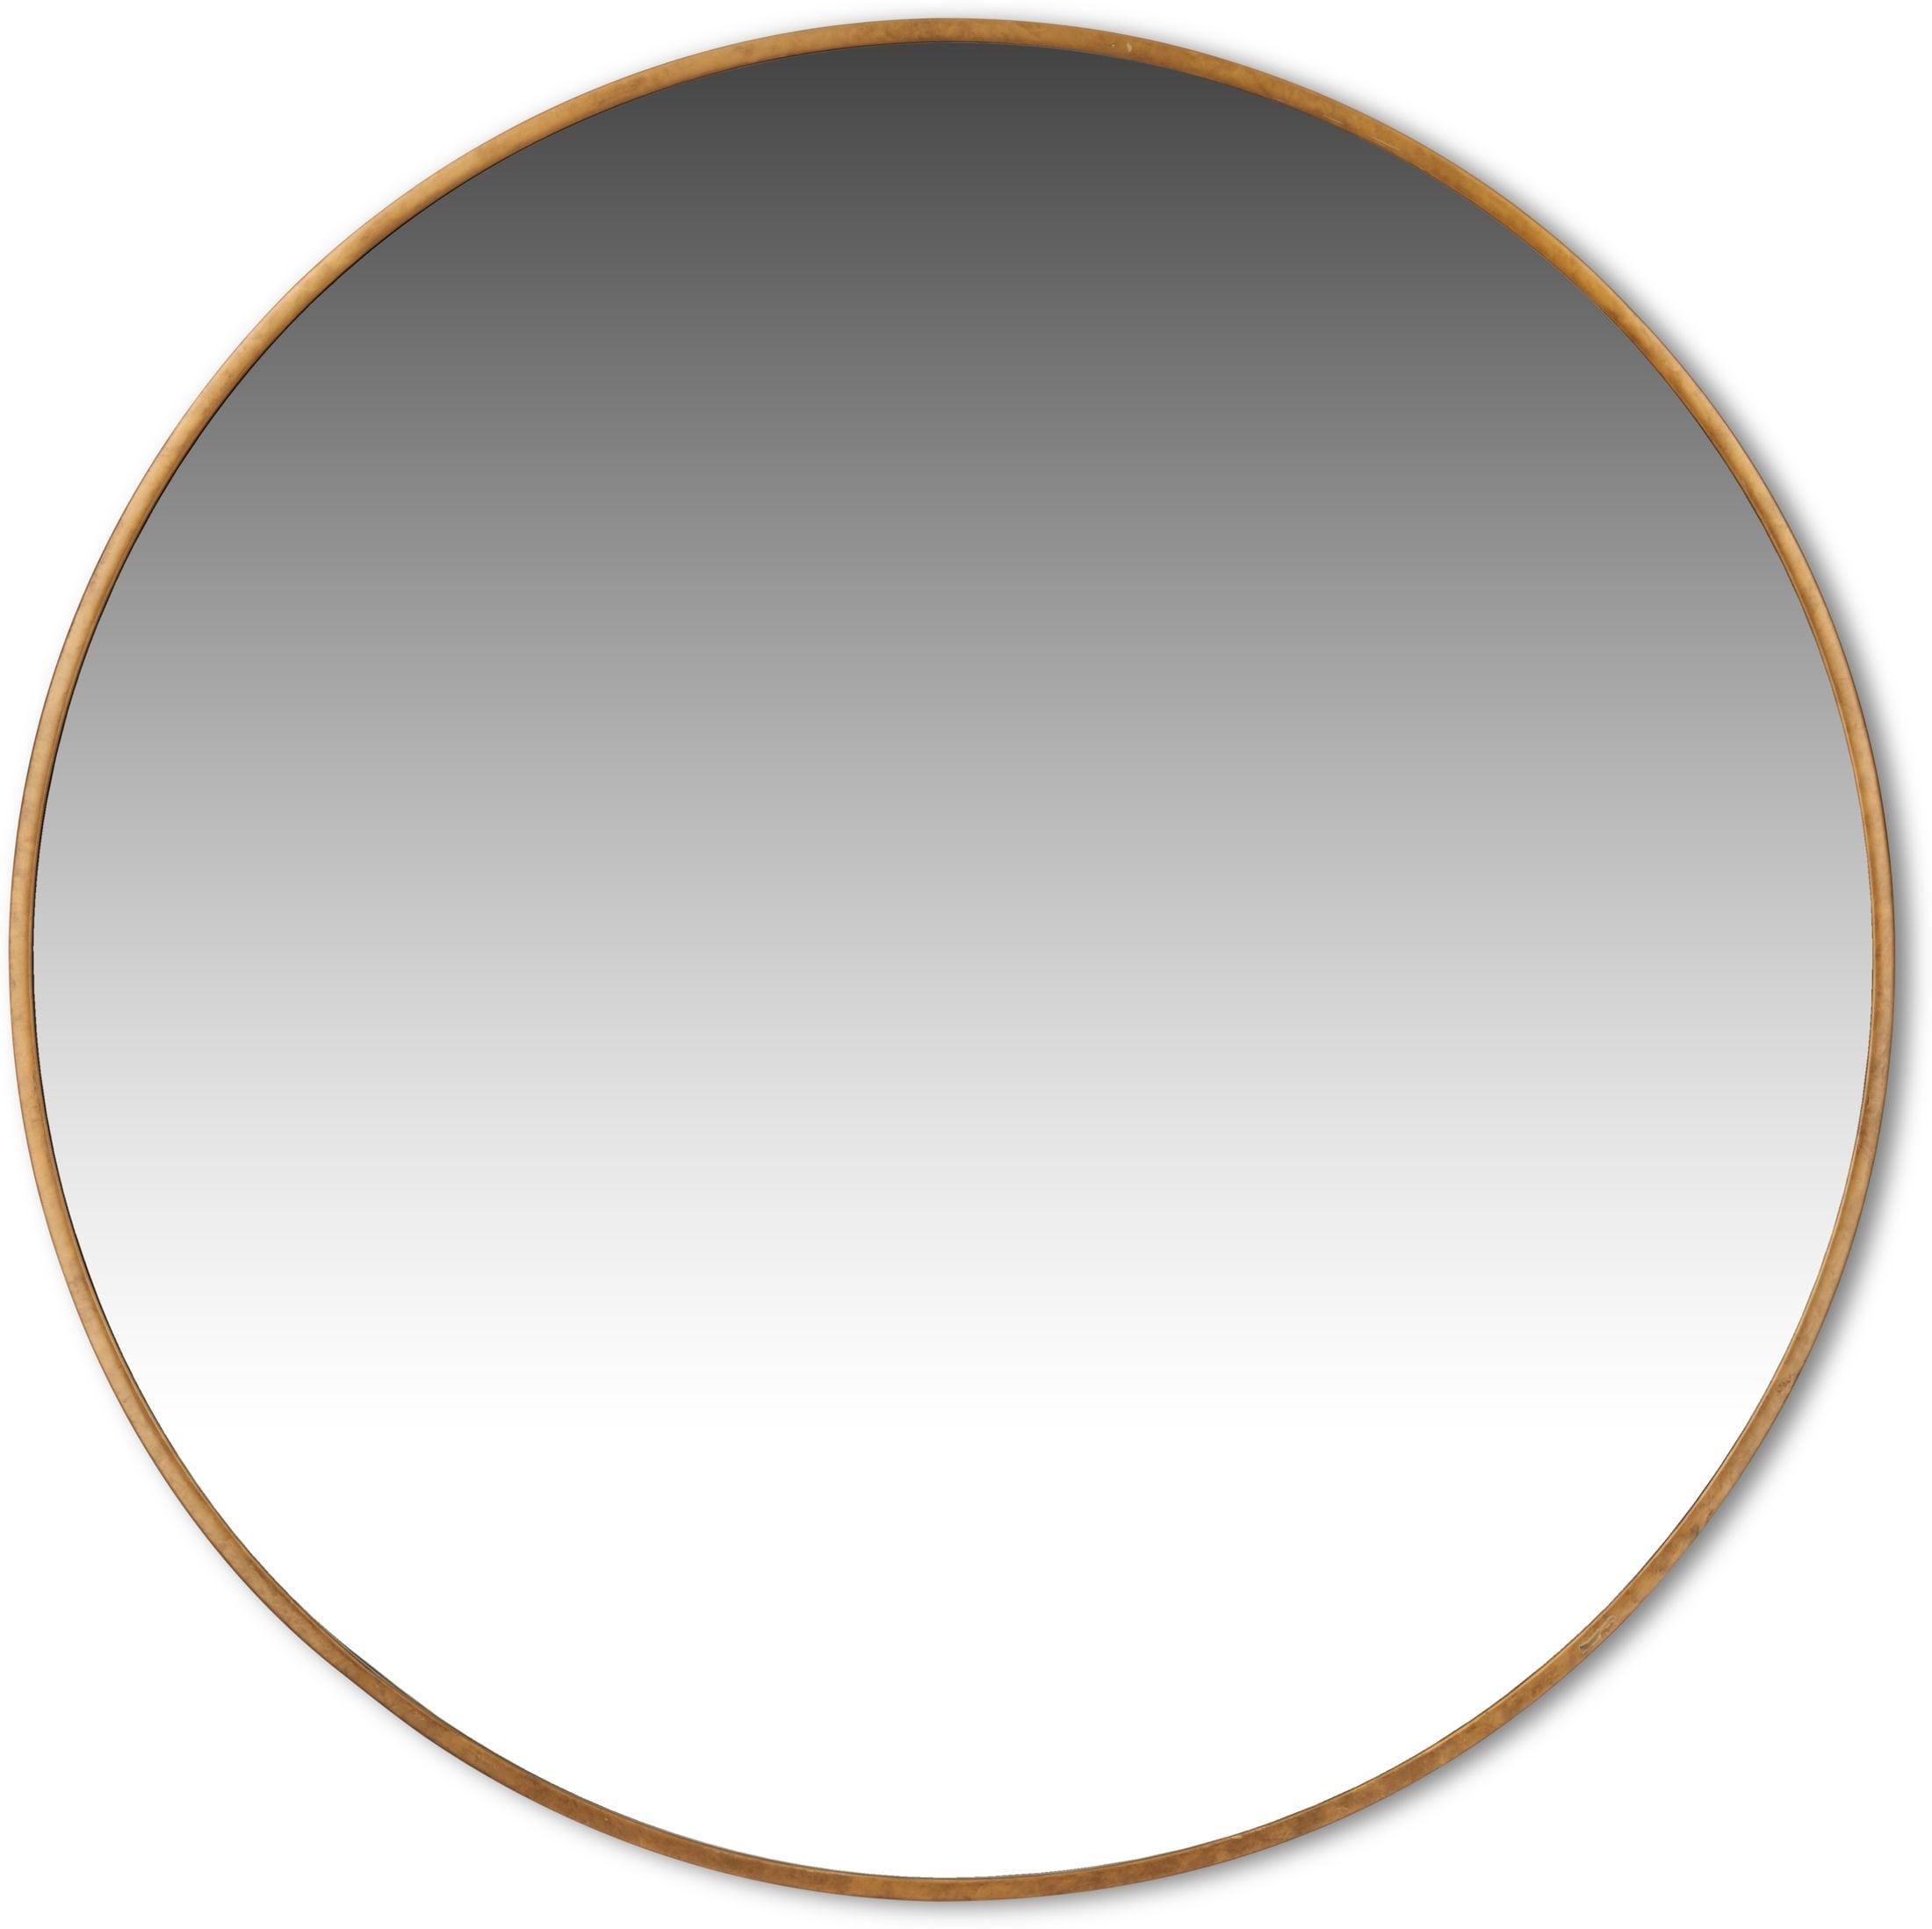 Home Accessories - Large Round Mirror